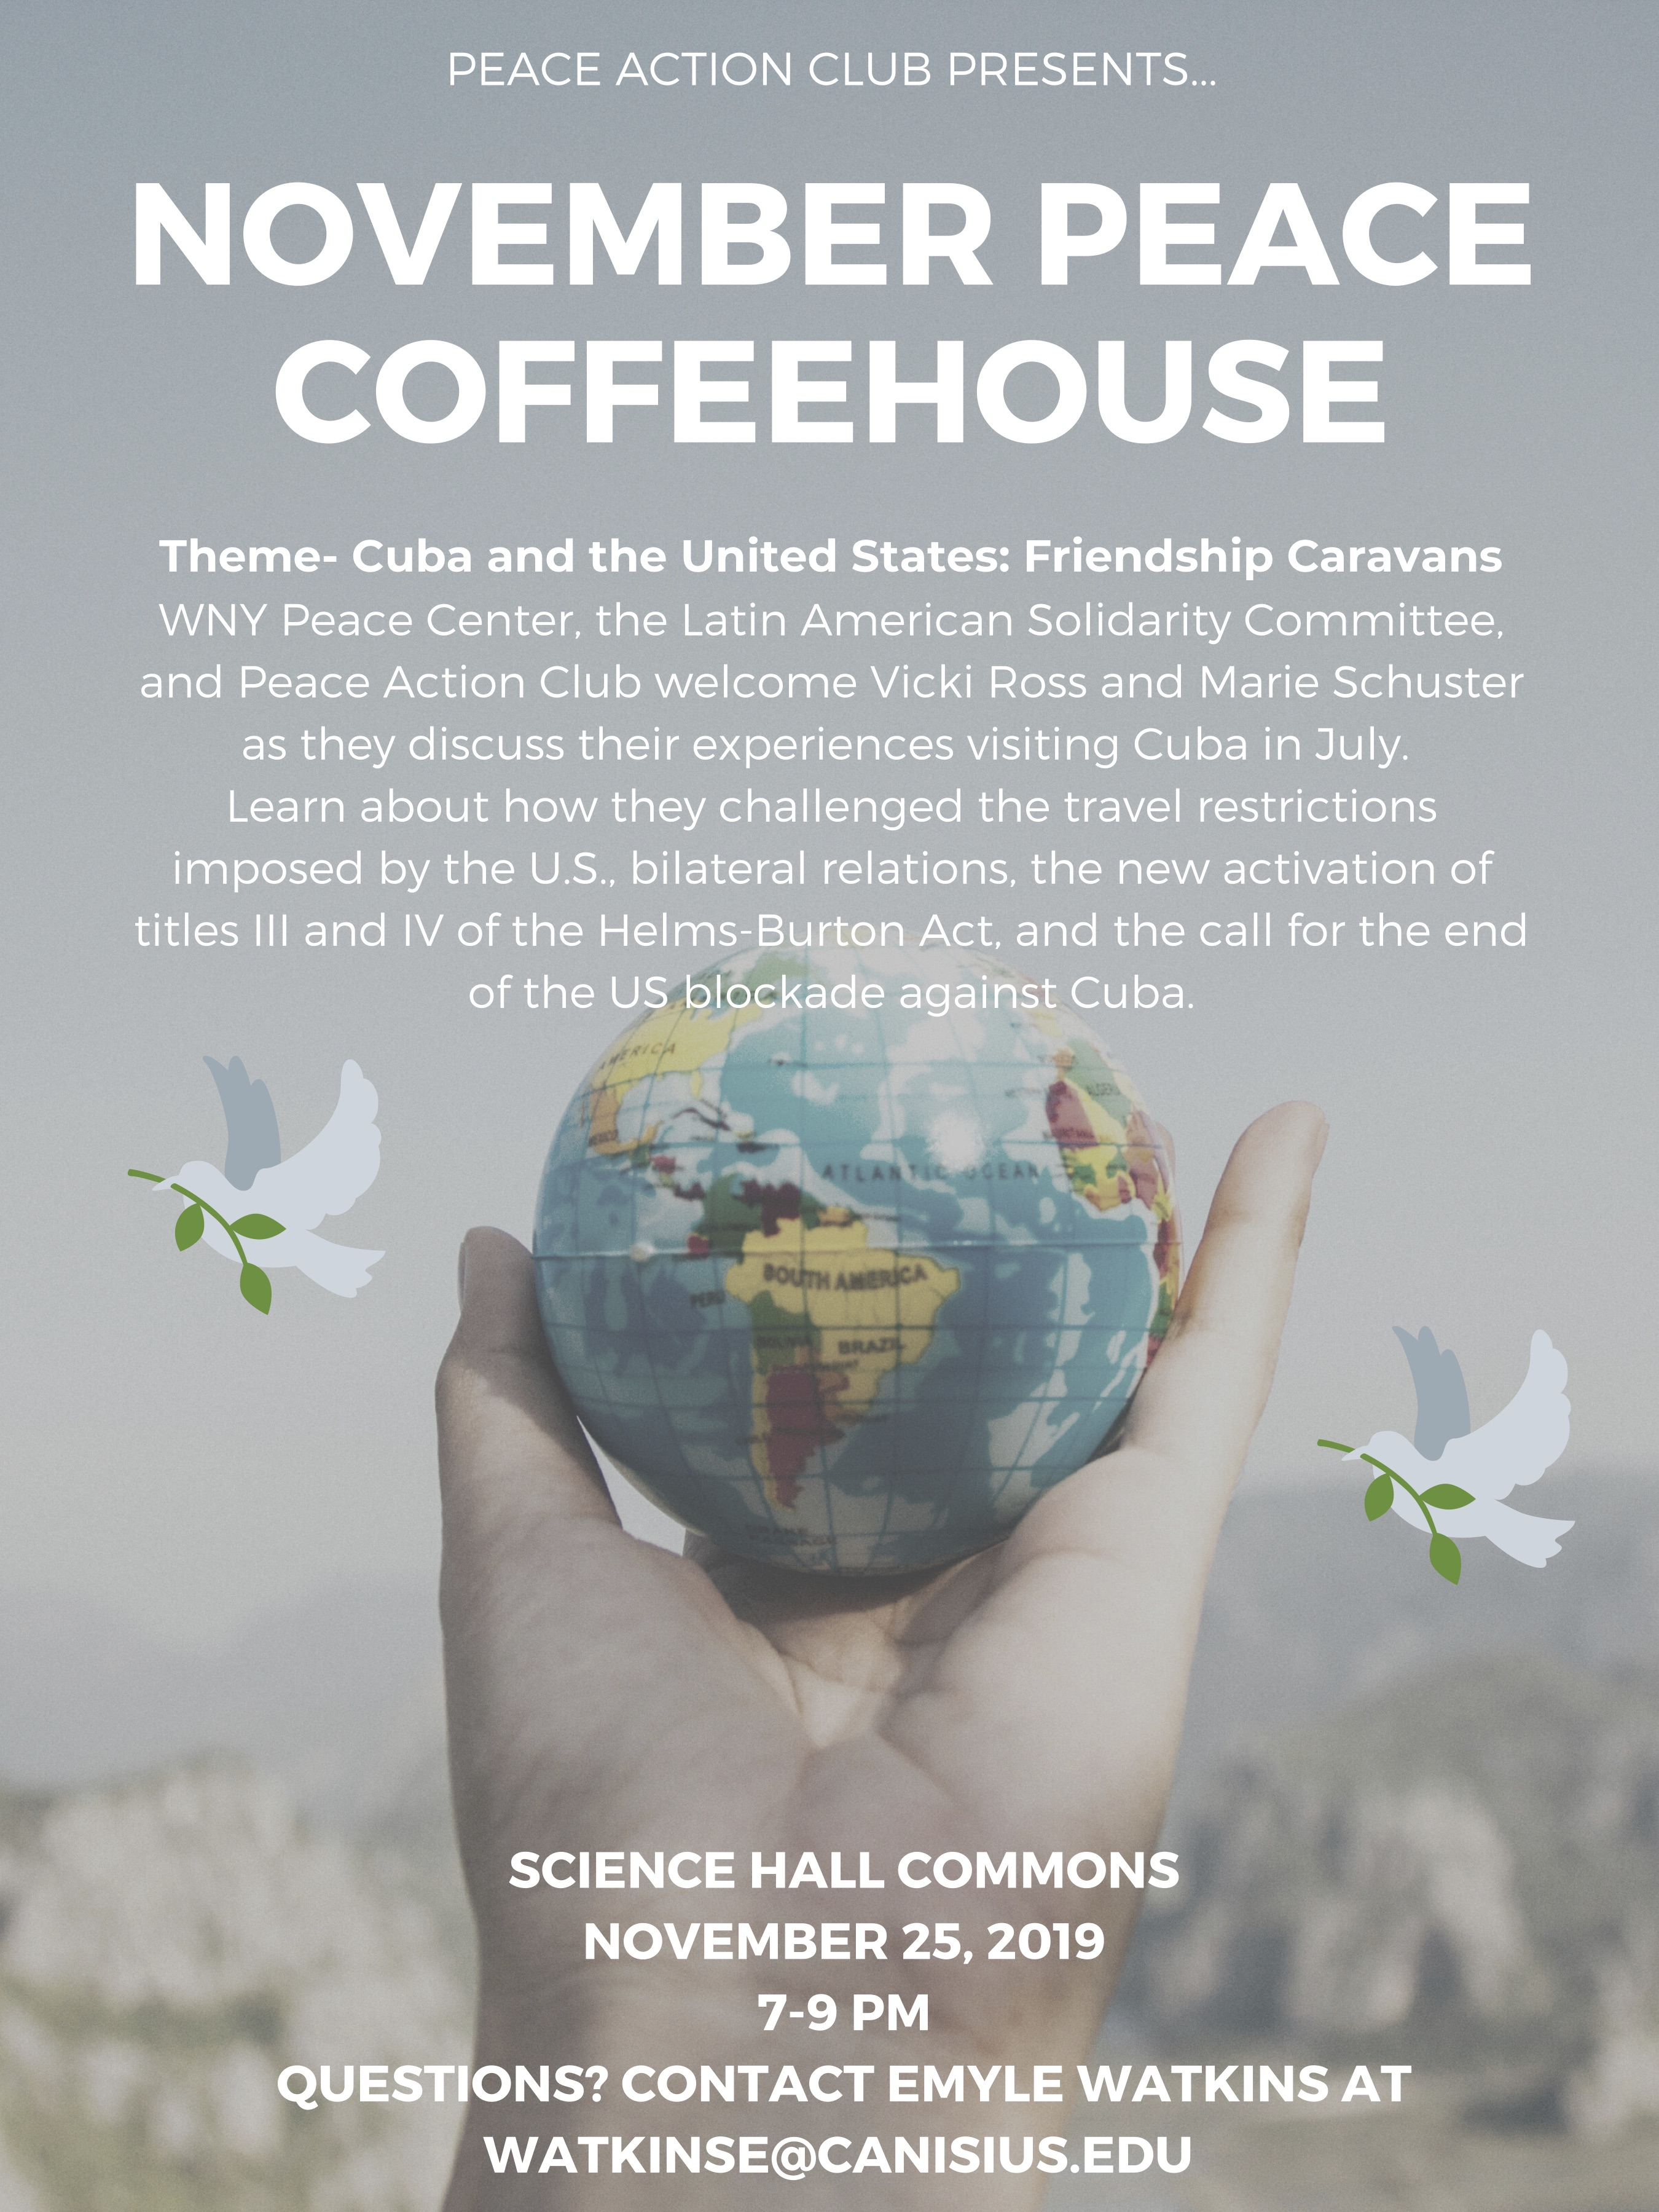 November Peace Coffeehouse.jpg